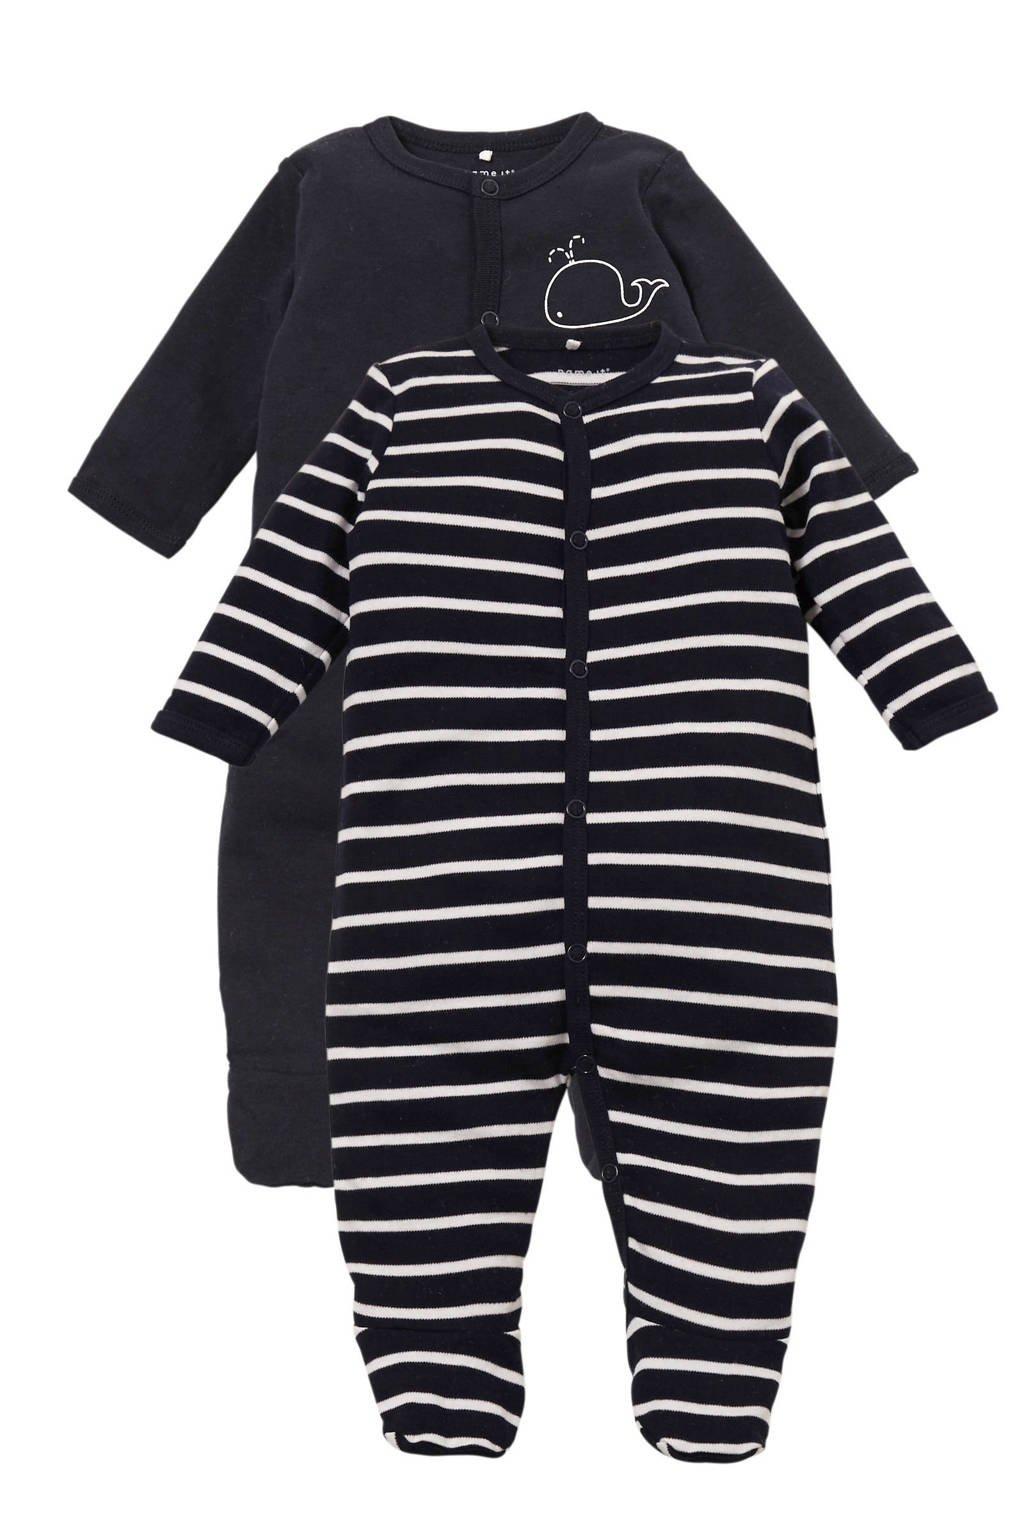 name it BABY   newborn gestreepte pyjama - set van 2, Donkerblauw/wit